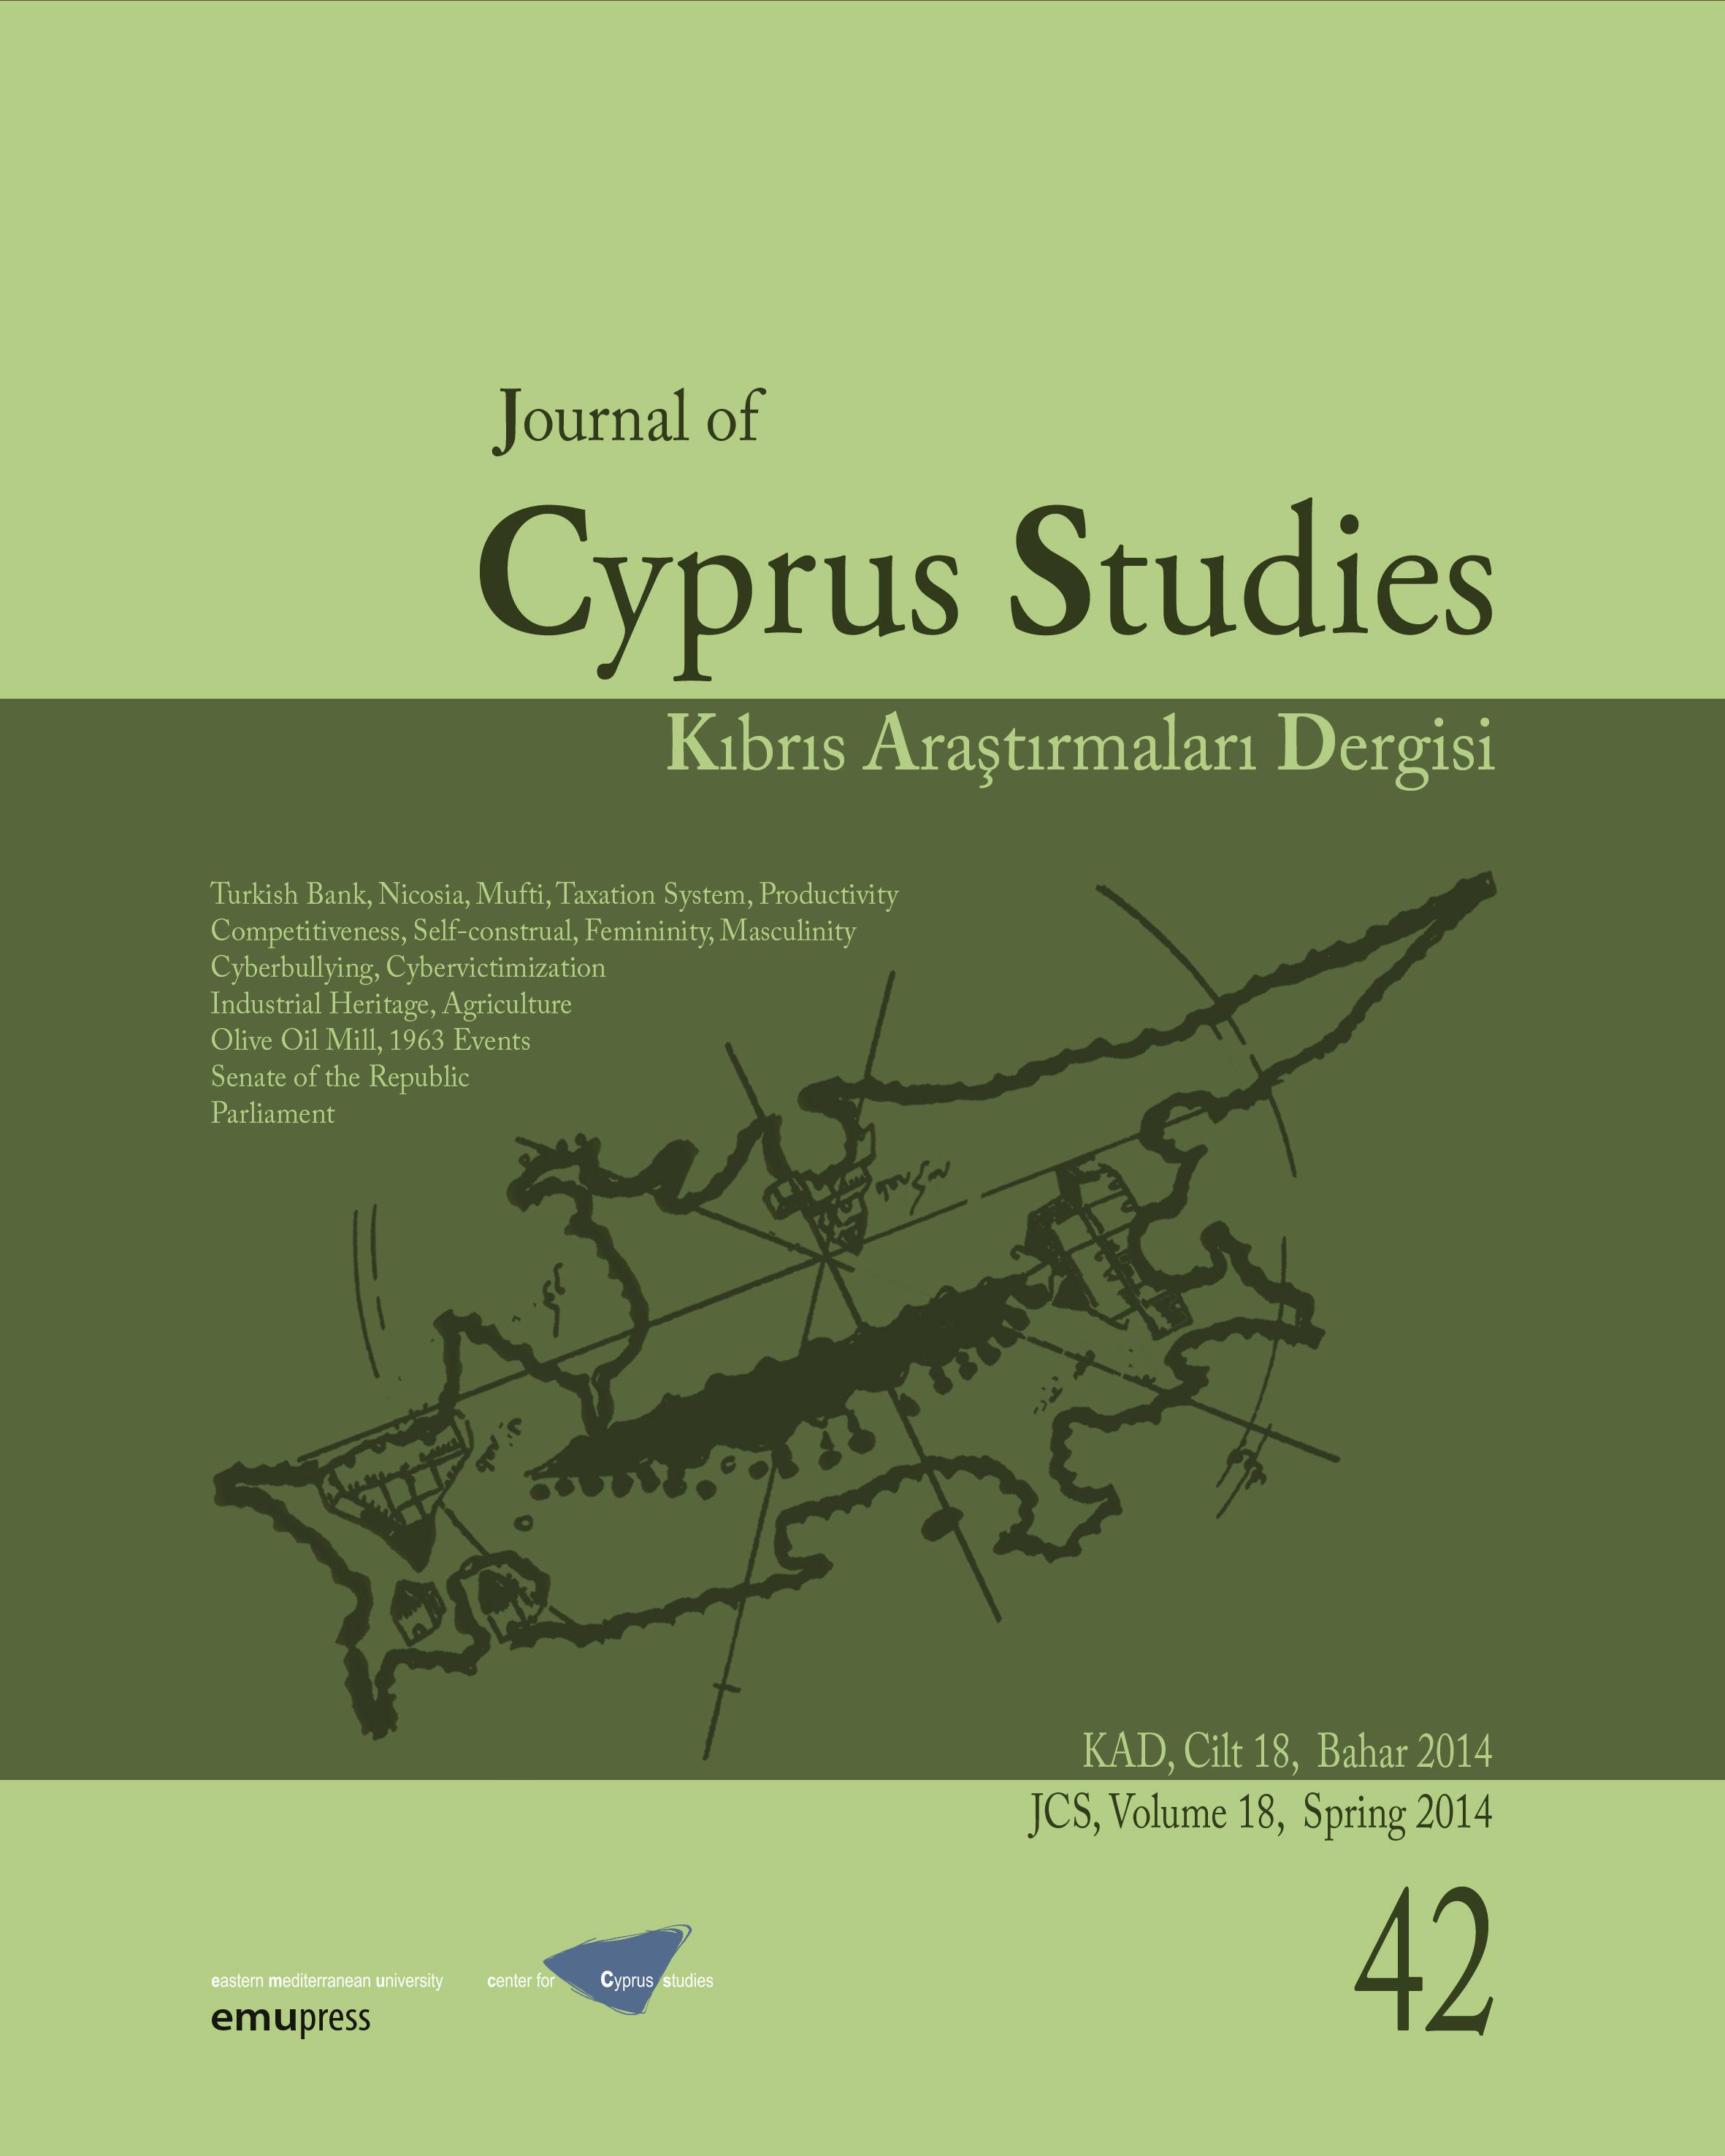 View Vol. 18 No. 42 (2014): Journal of Cyprus Studies